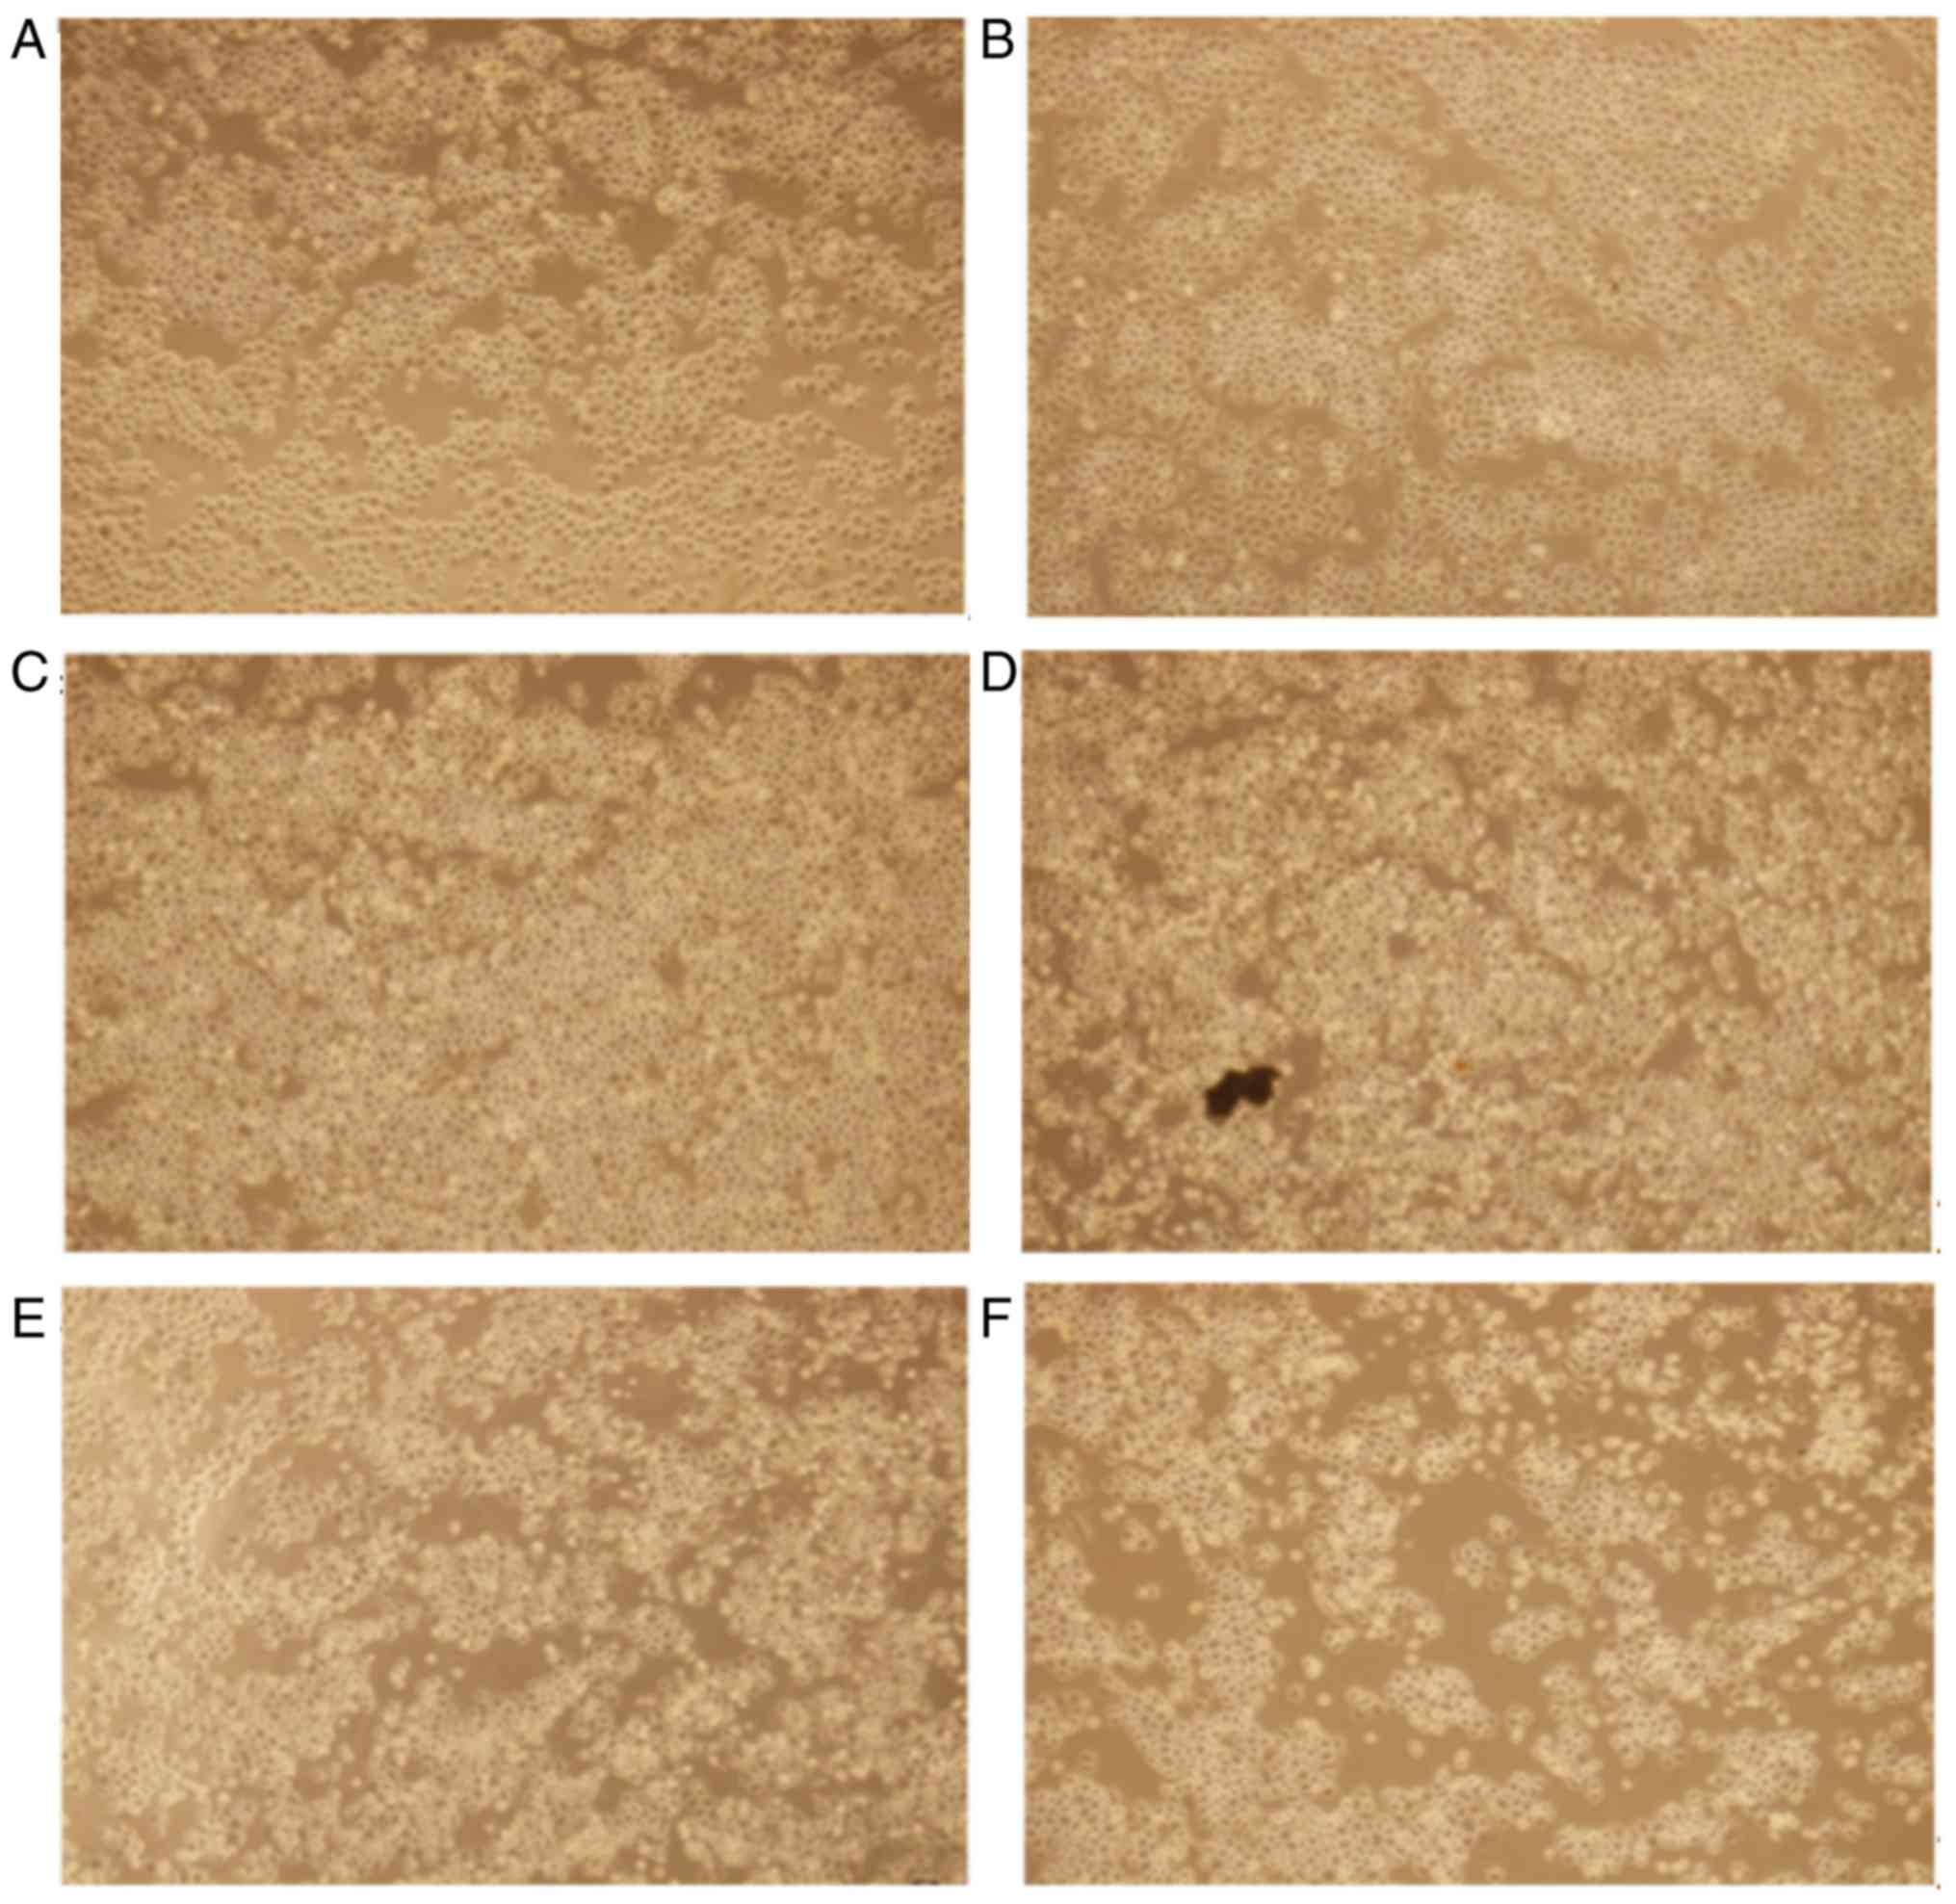 Propranolol induces hemangioma endothelial cell apoptosis via a p53